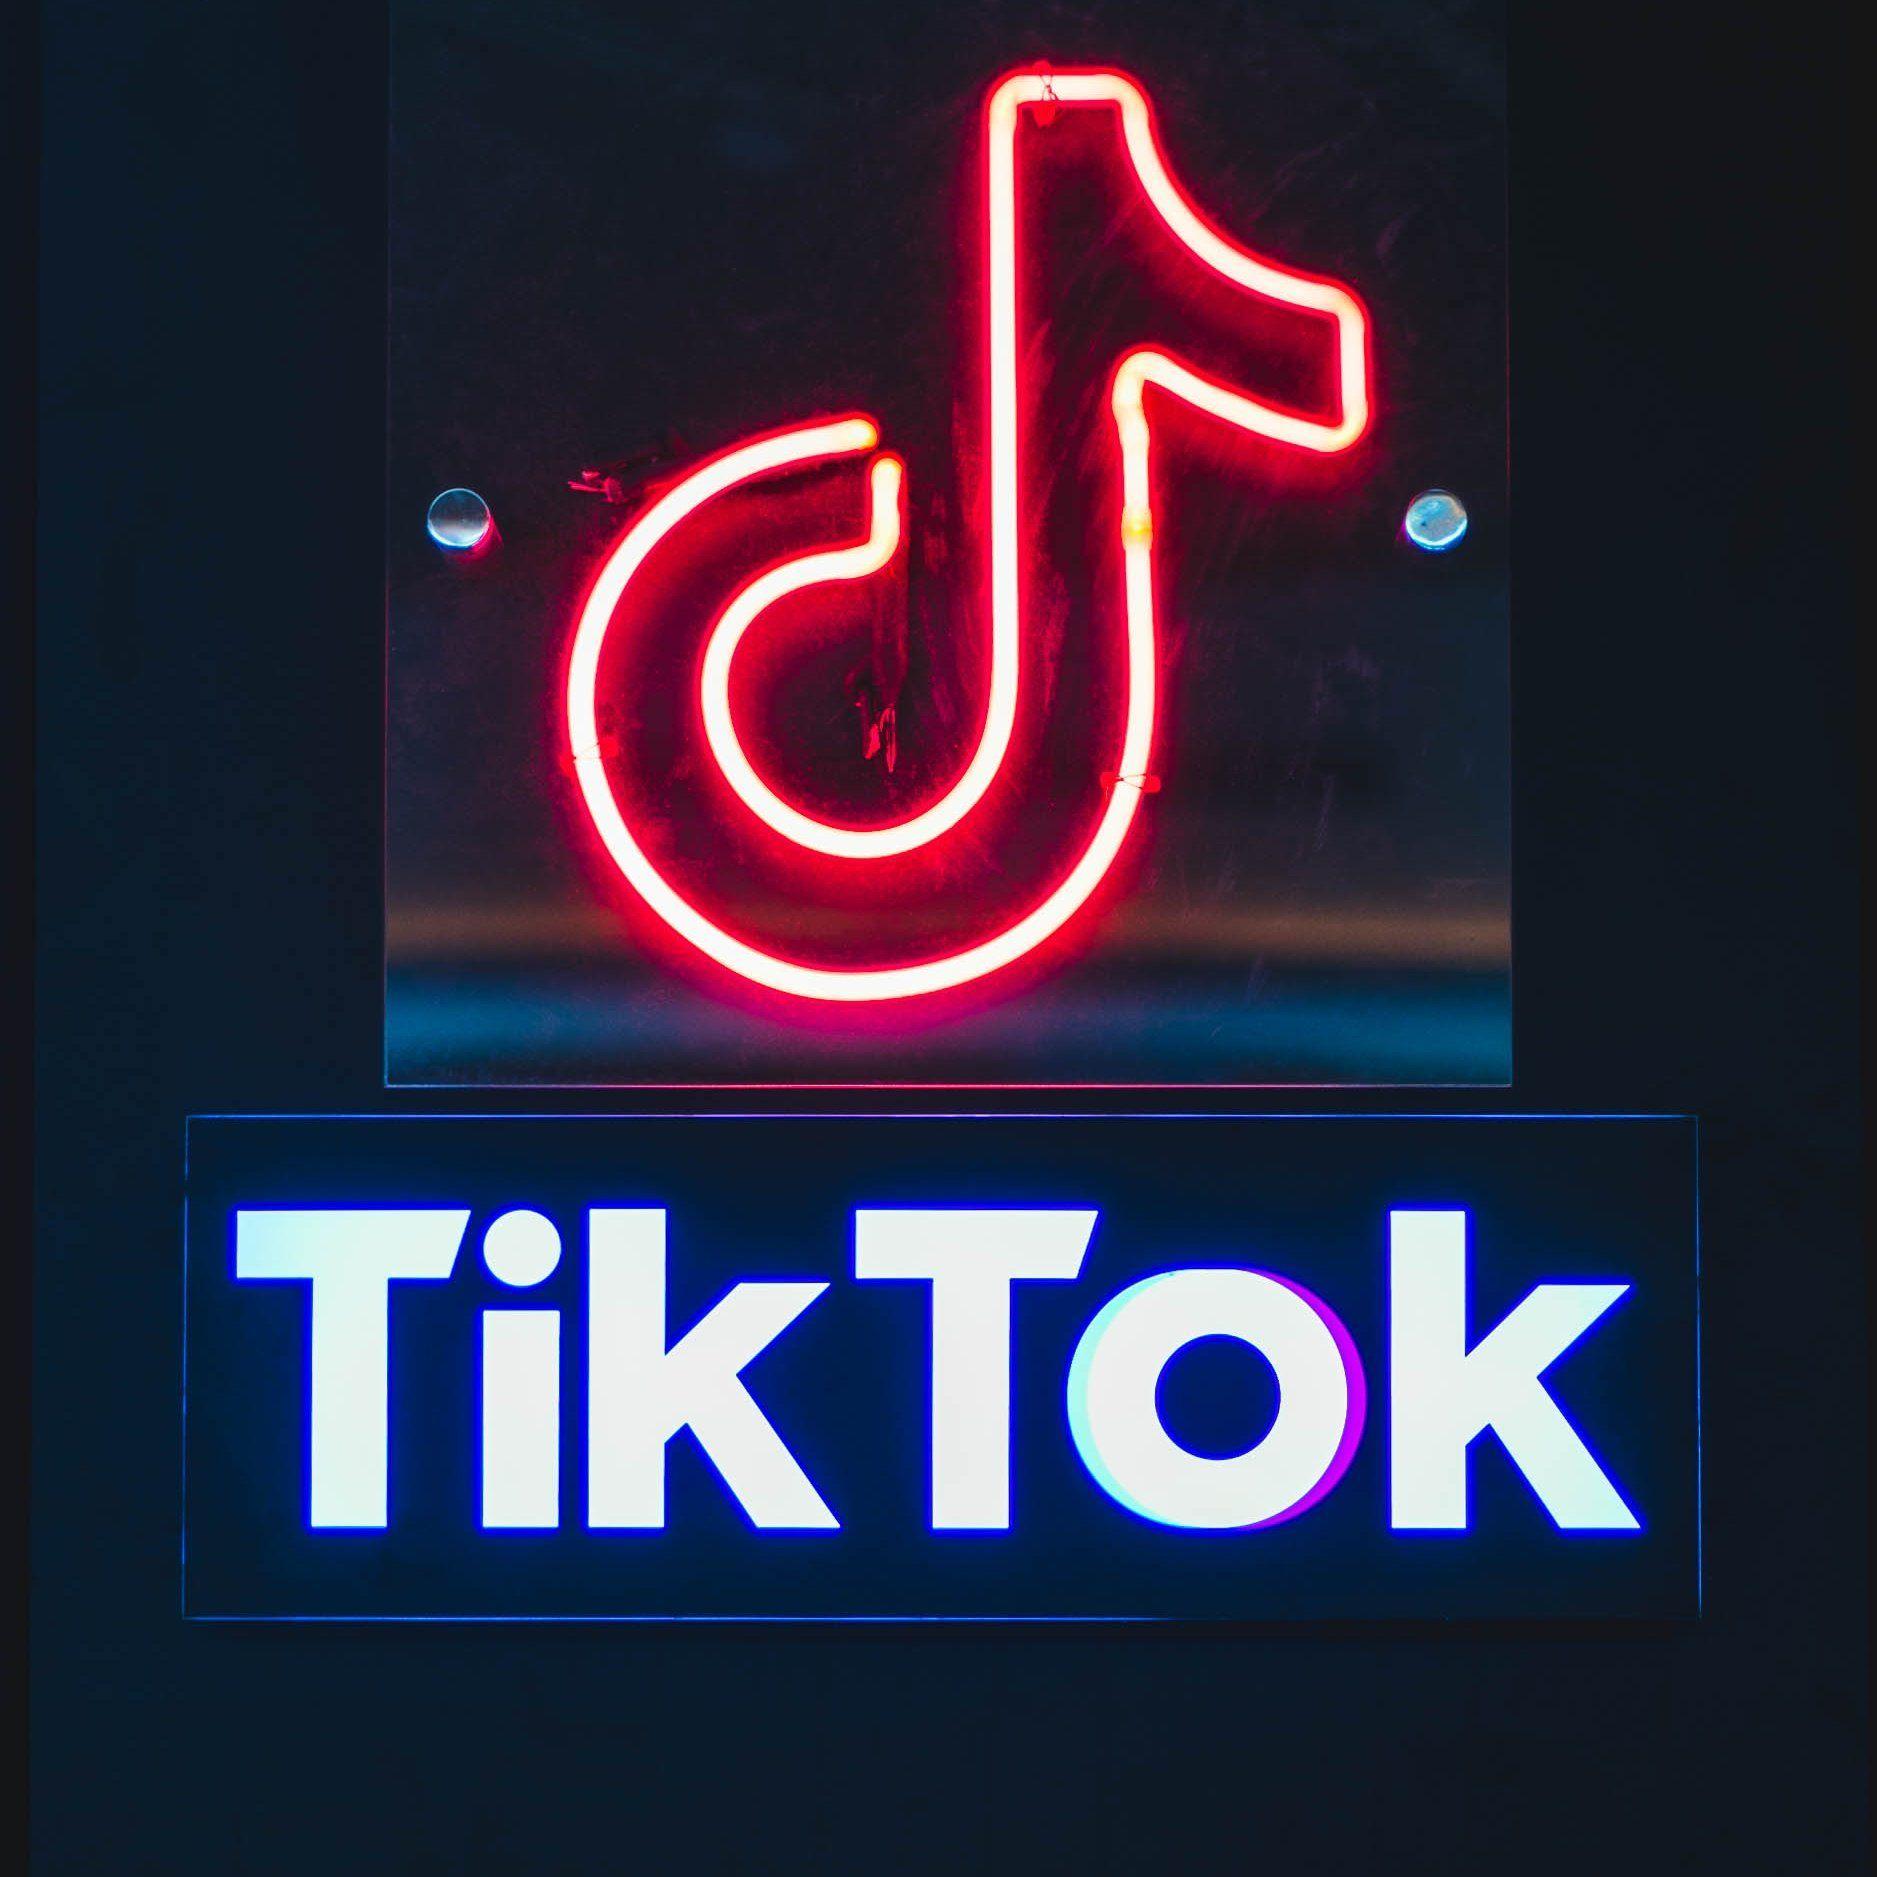 Red Neon Tiktok Icon Google Search Wallpaper Iphone Neon Neon Wallpaper Iphone Wallpaper Vintage